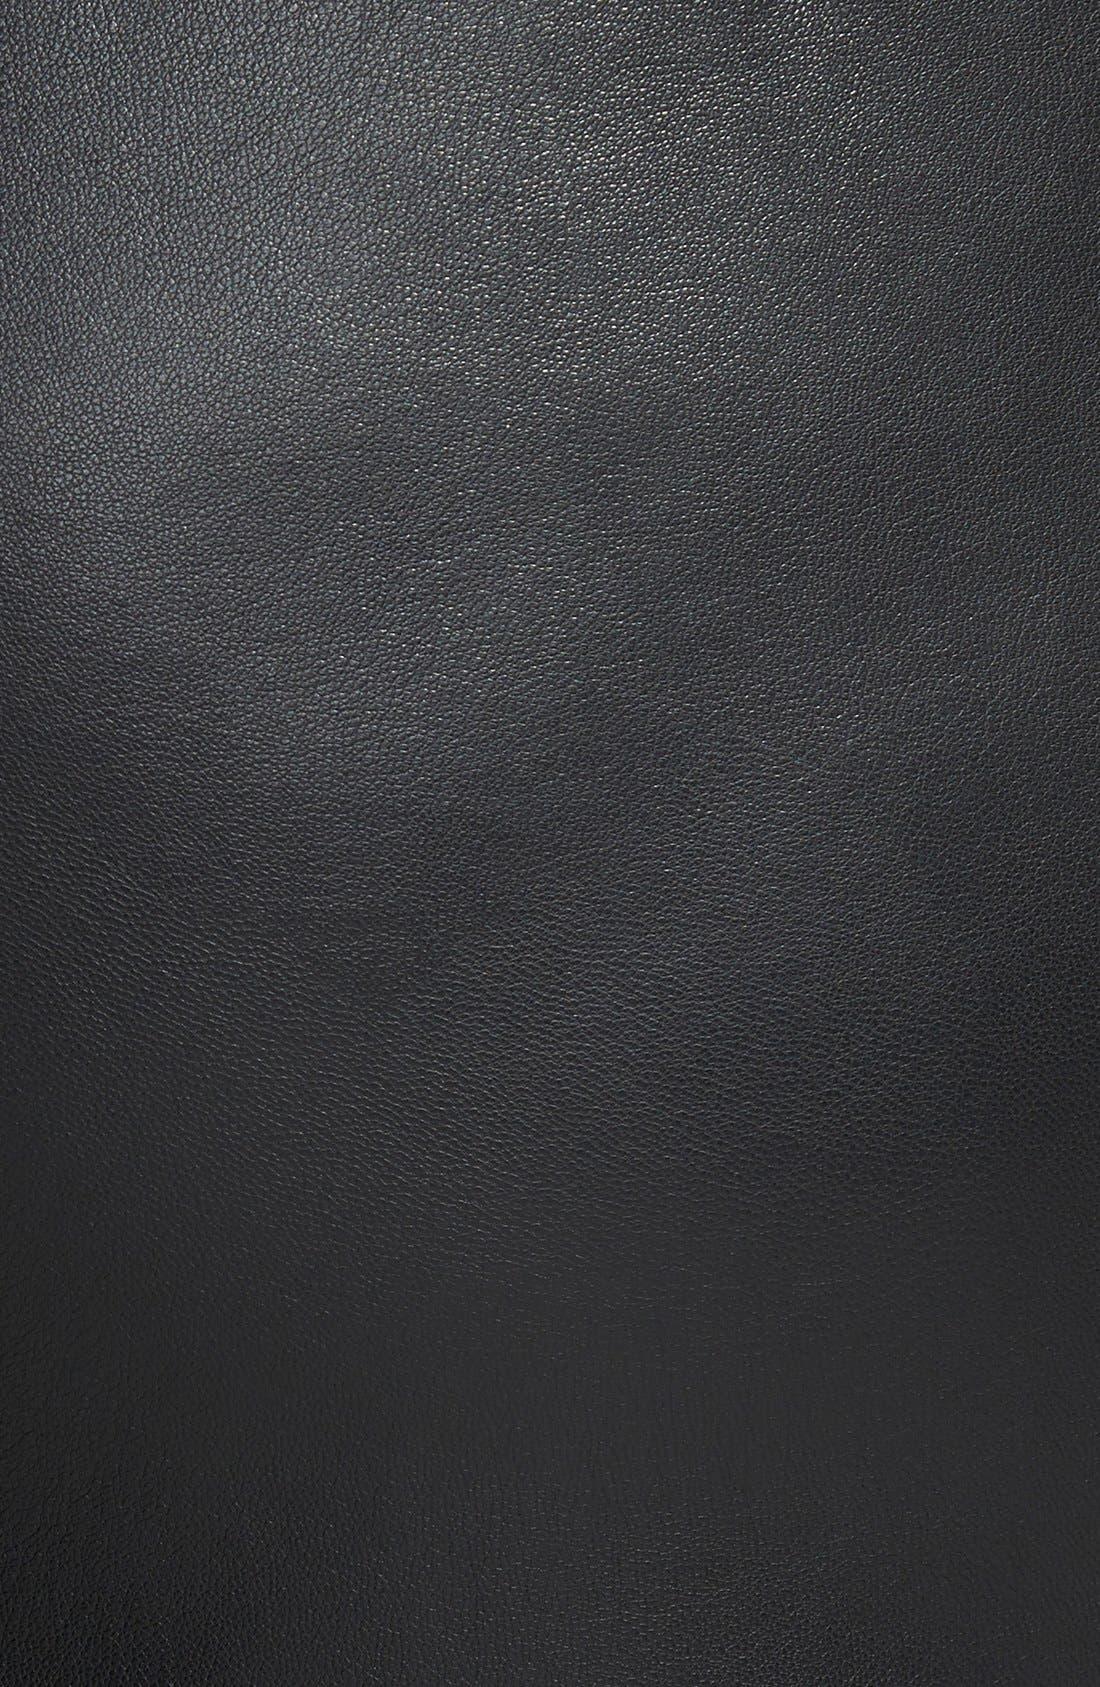 ELOQUII,                             Studio Faux Leather Culottes,                             Alternate thumbnail 2, color,                             001